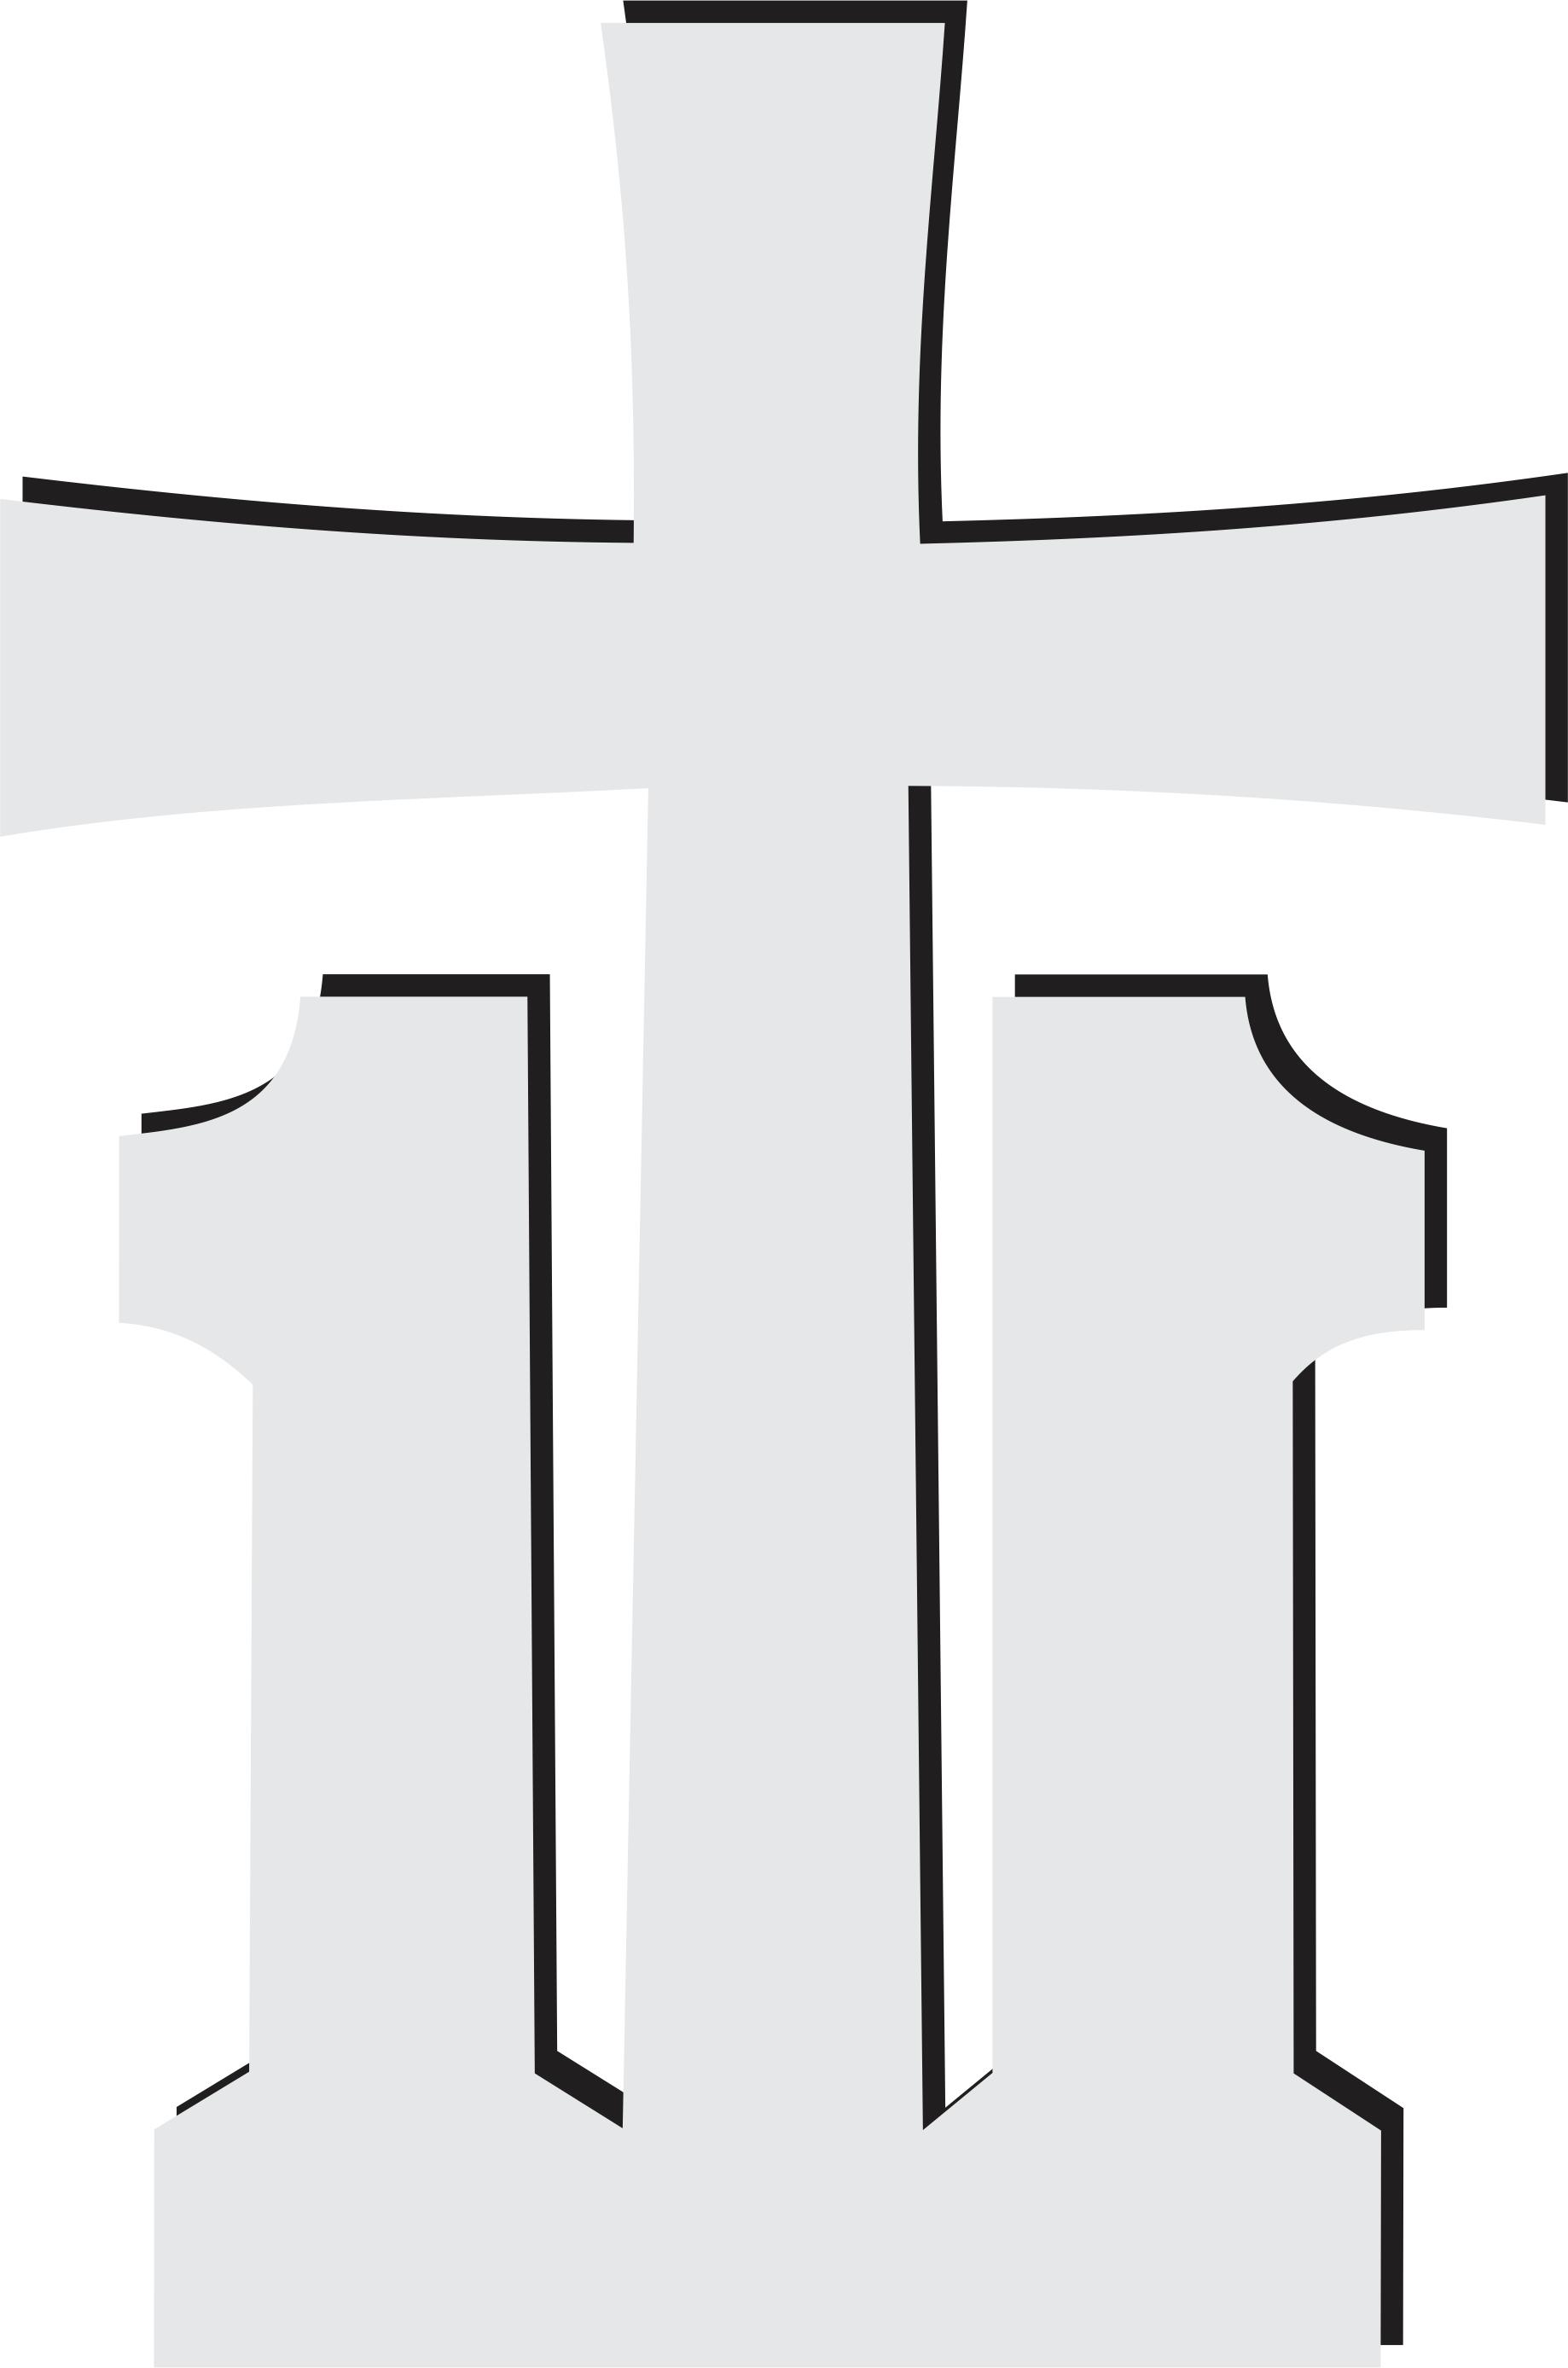 Biserica Crestina Baptista nr. 11 logo